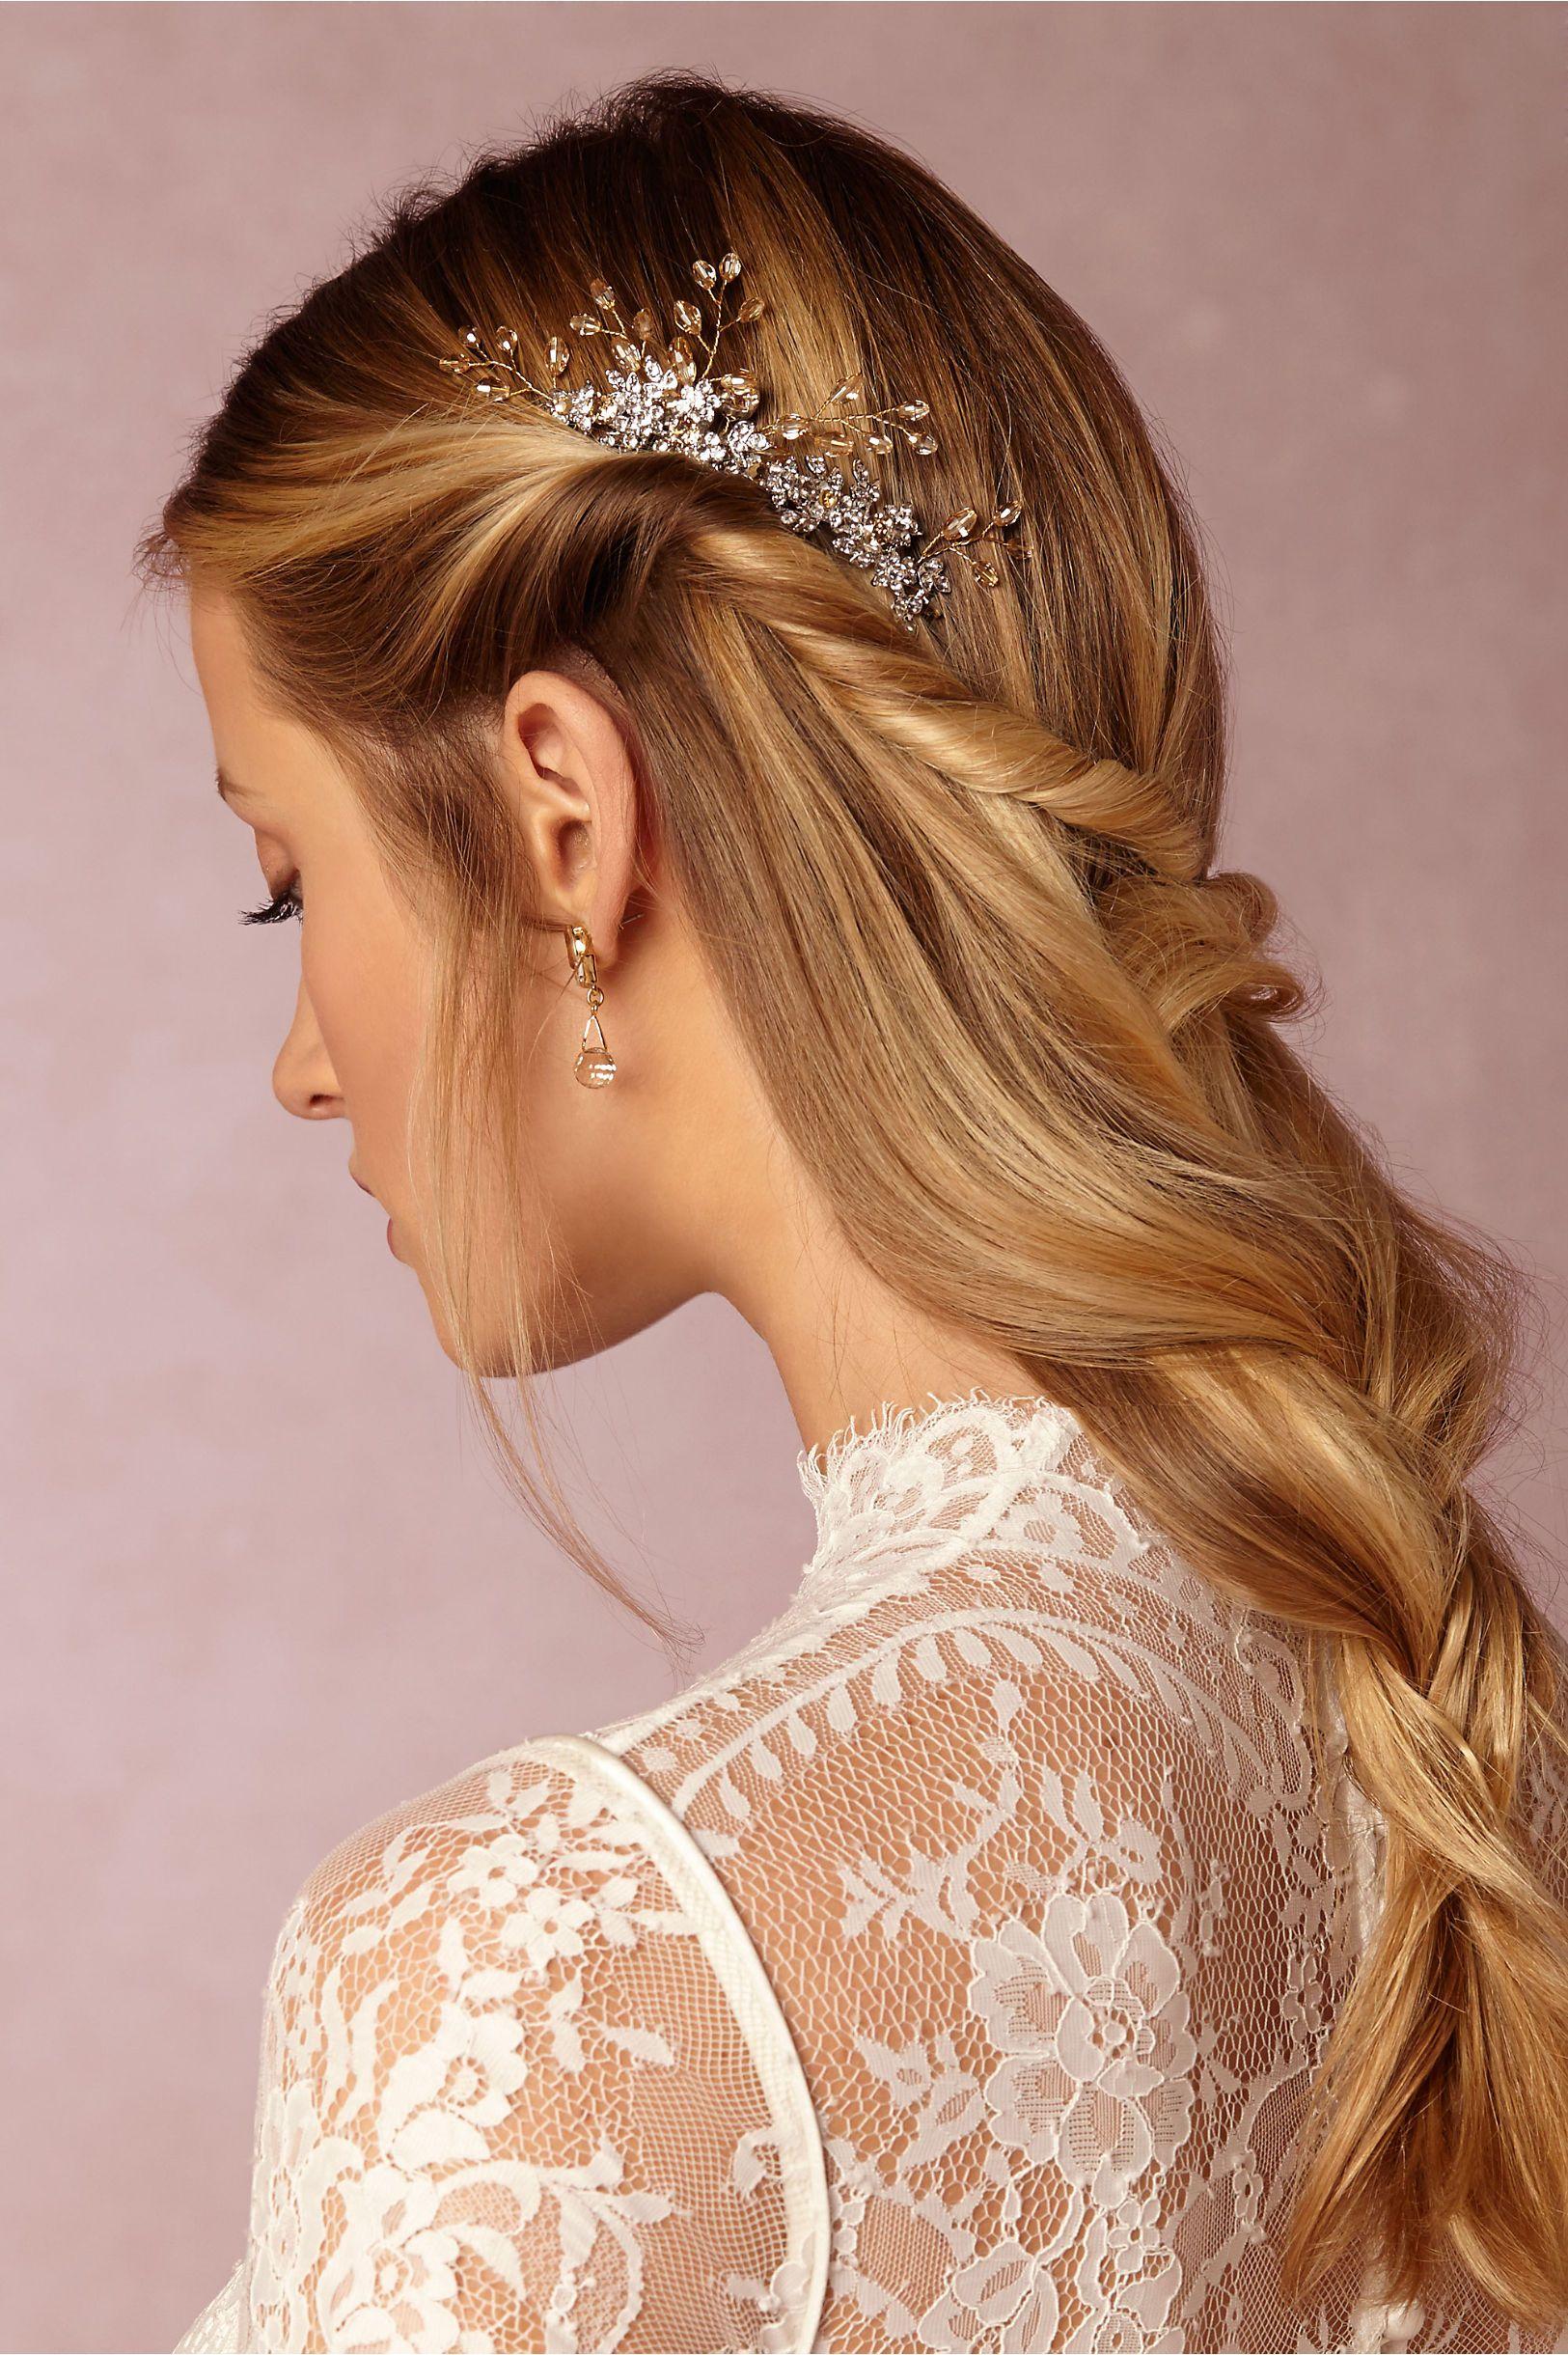 bhldn cork-pop comb in bride veils & headpieces pins, clips